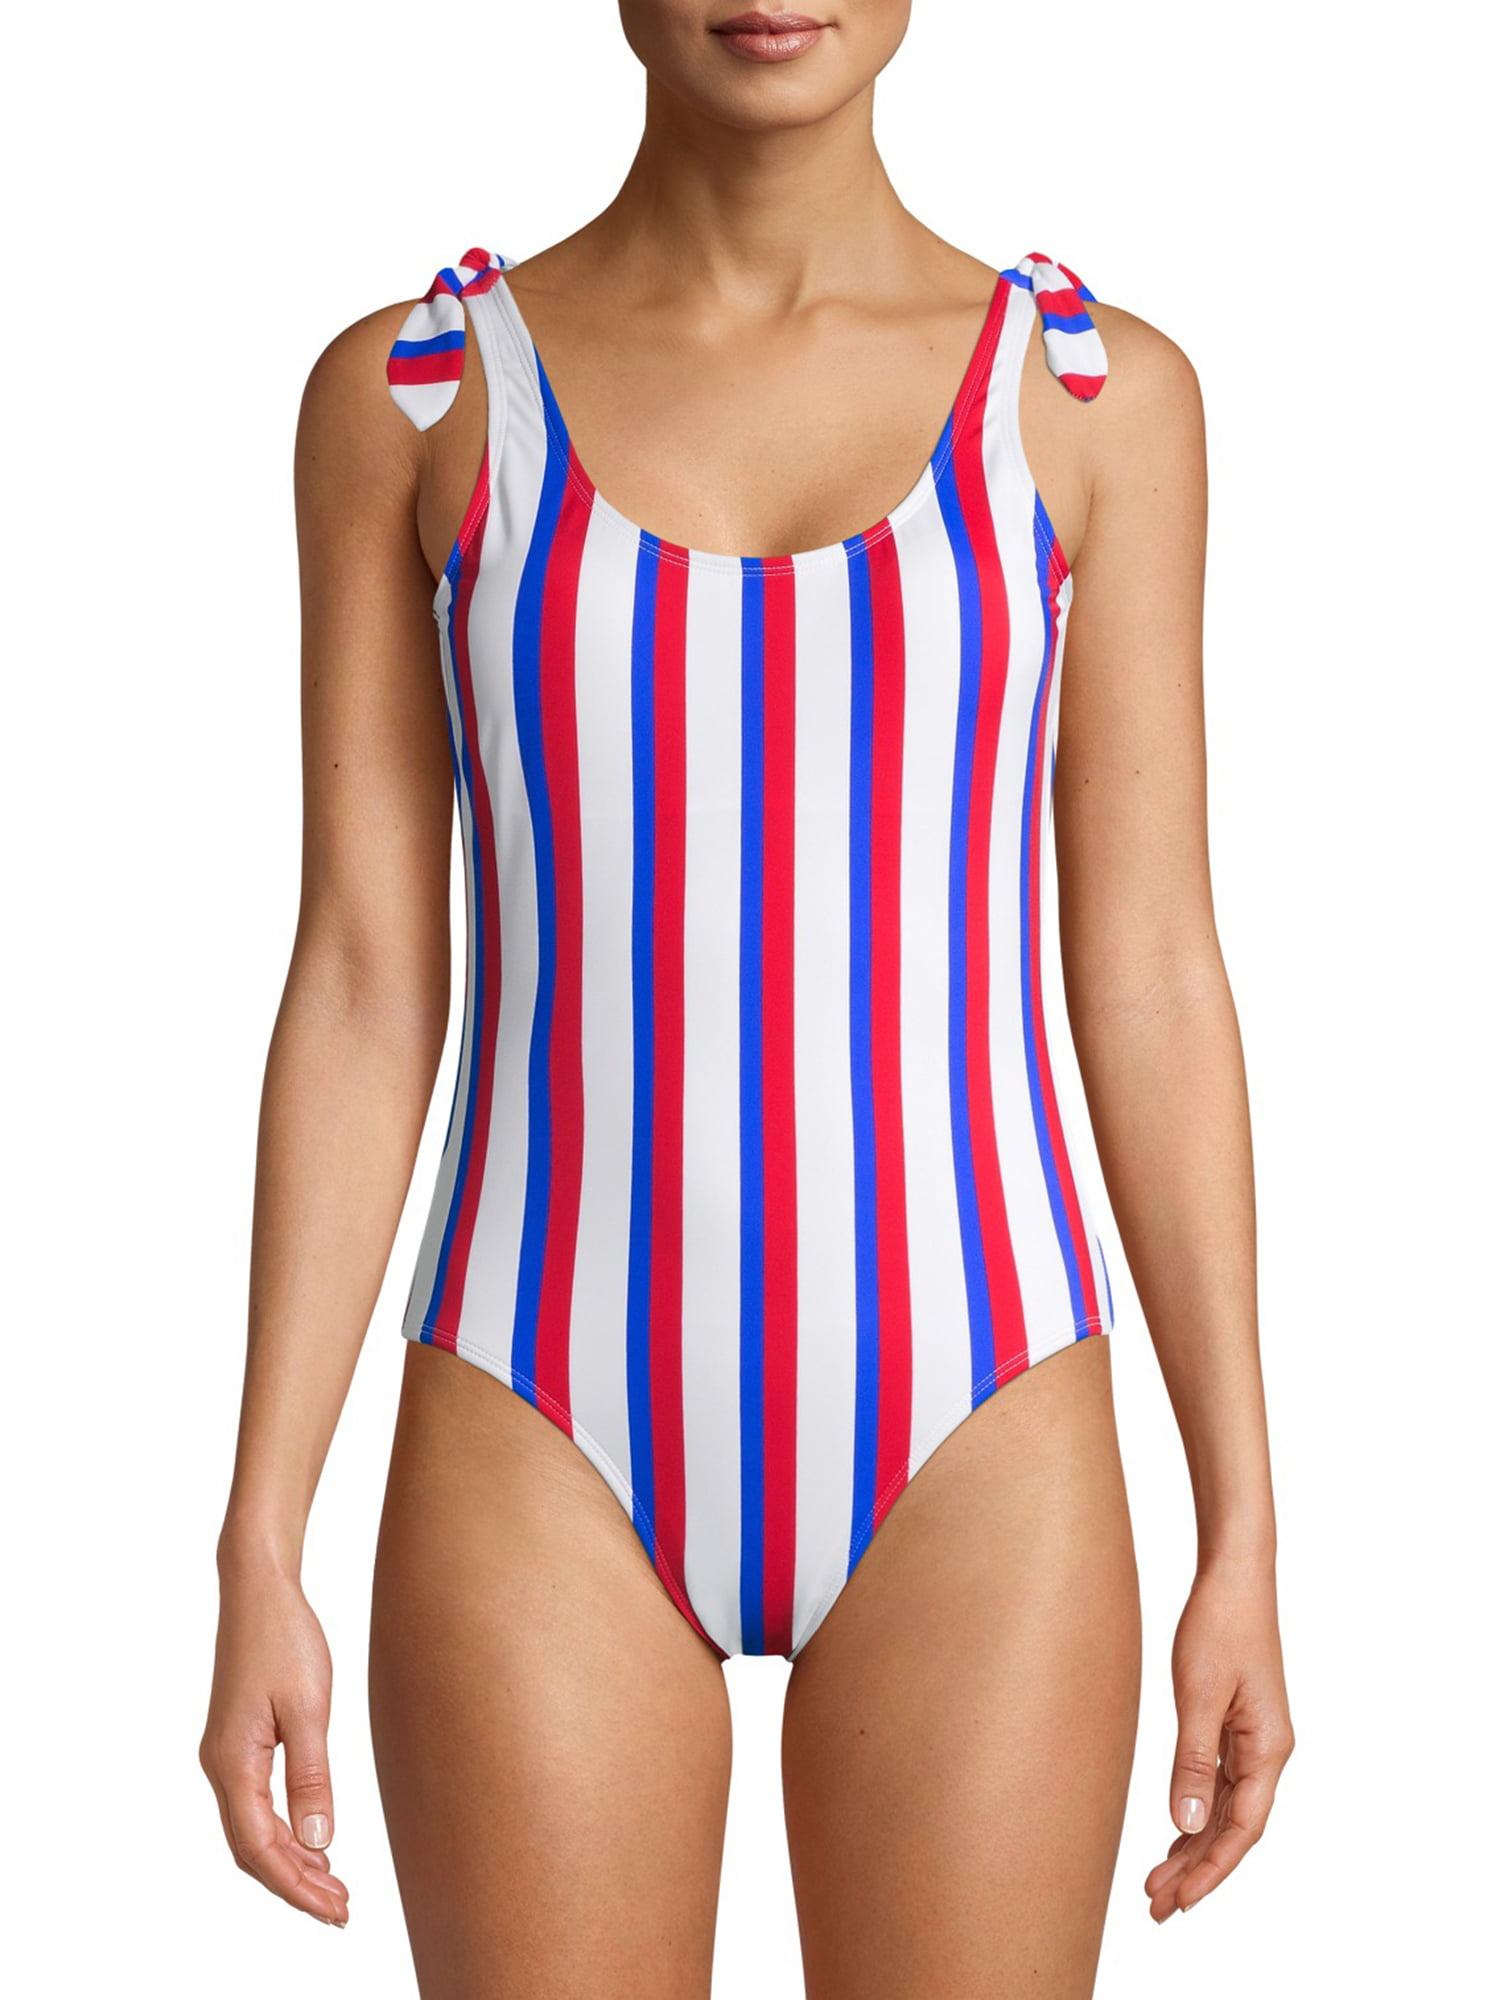 Details about  /ARIZONA Jr Black Stripe Mlt Swim Flounce Top or Side Braid Bottom FREE Shpg NWTA